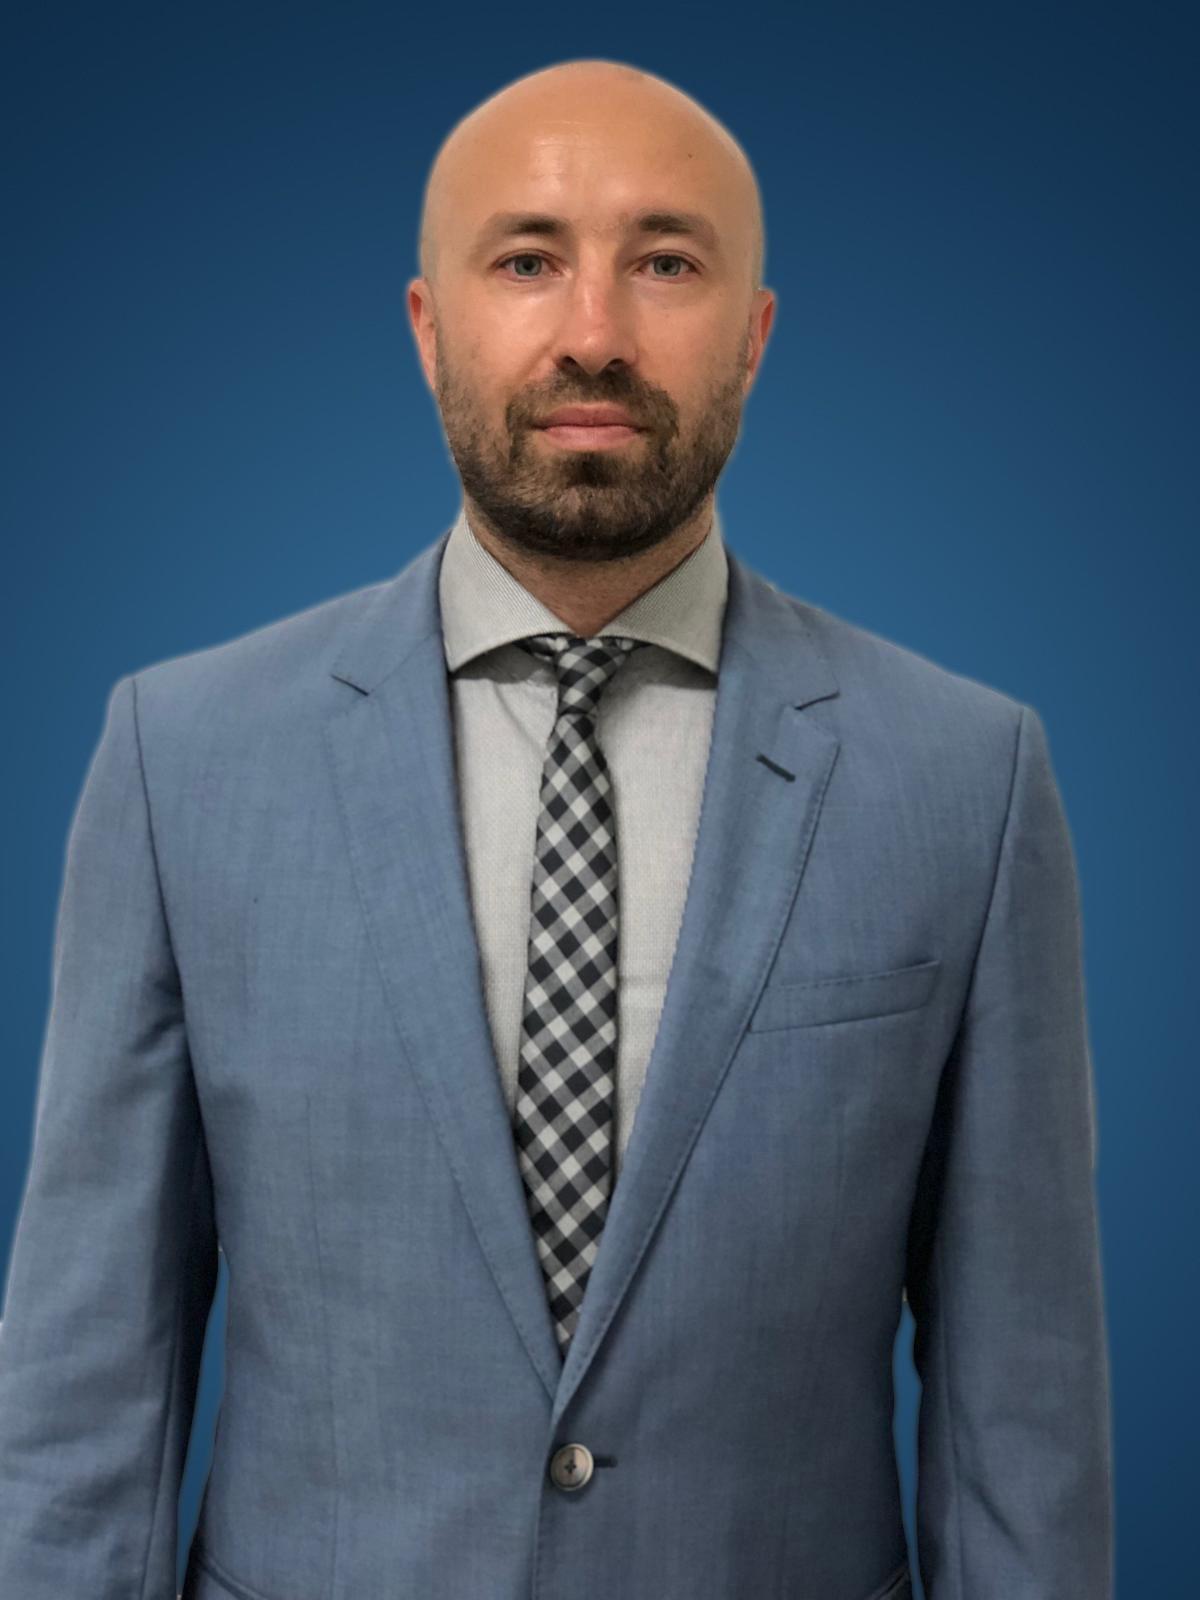 Дмитрий Ксенофонтов